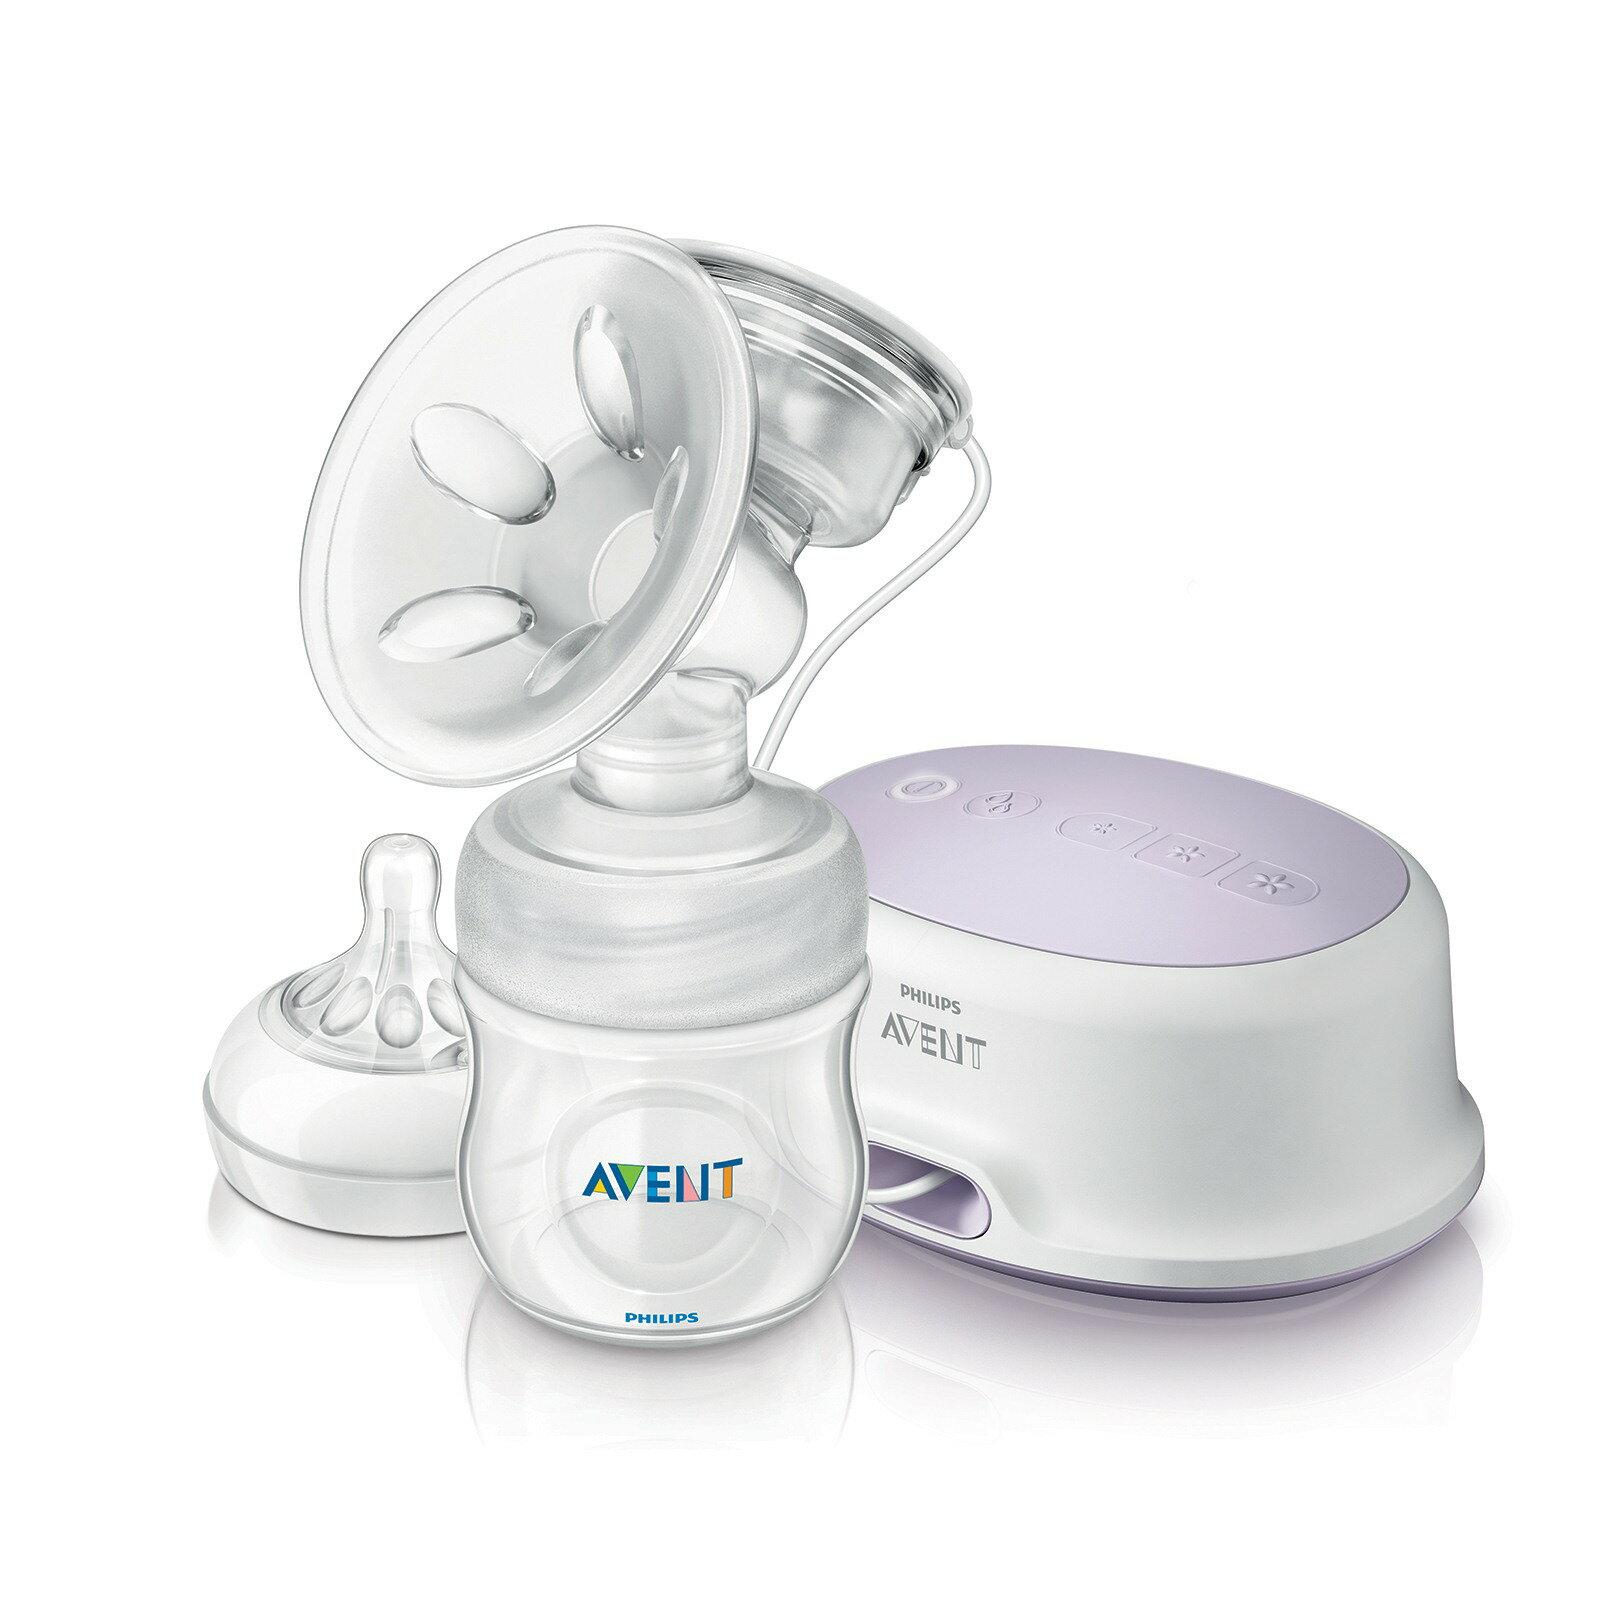 PHILIPS-AVENT 輕乳感PP標準型單邊電動吸乳器『121婦嬰用品館』